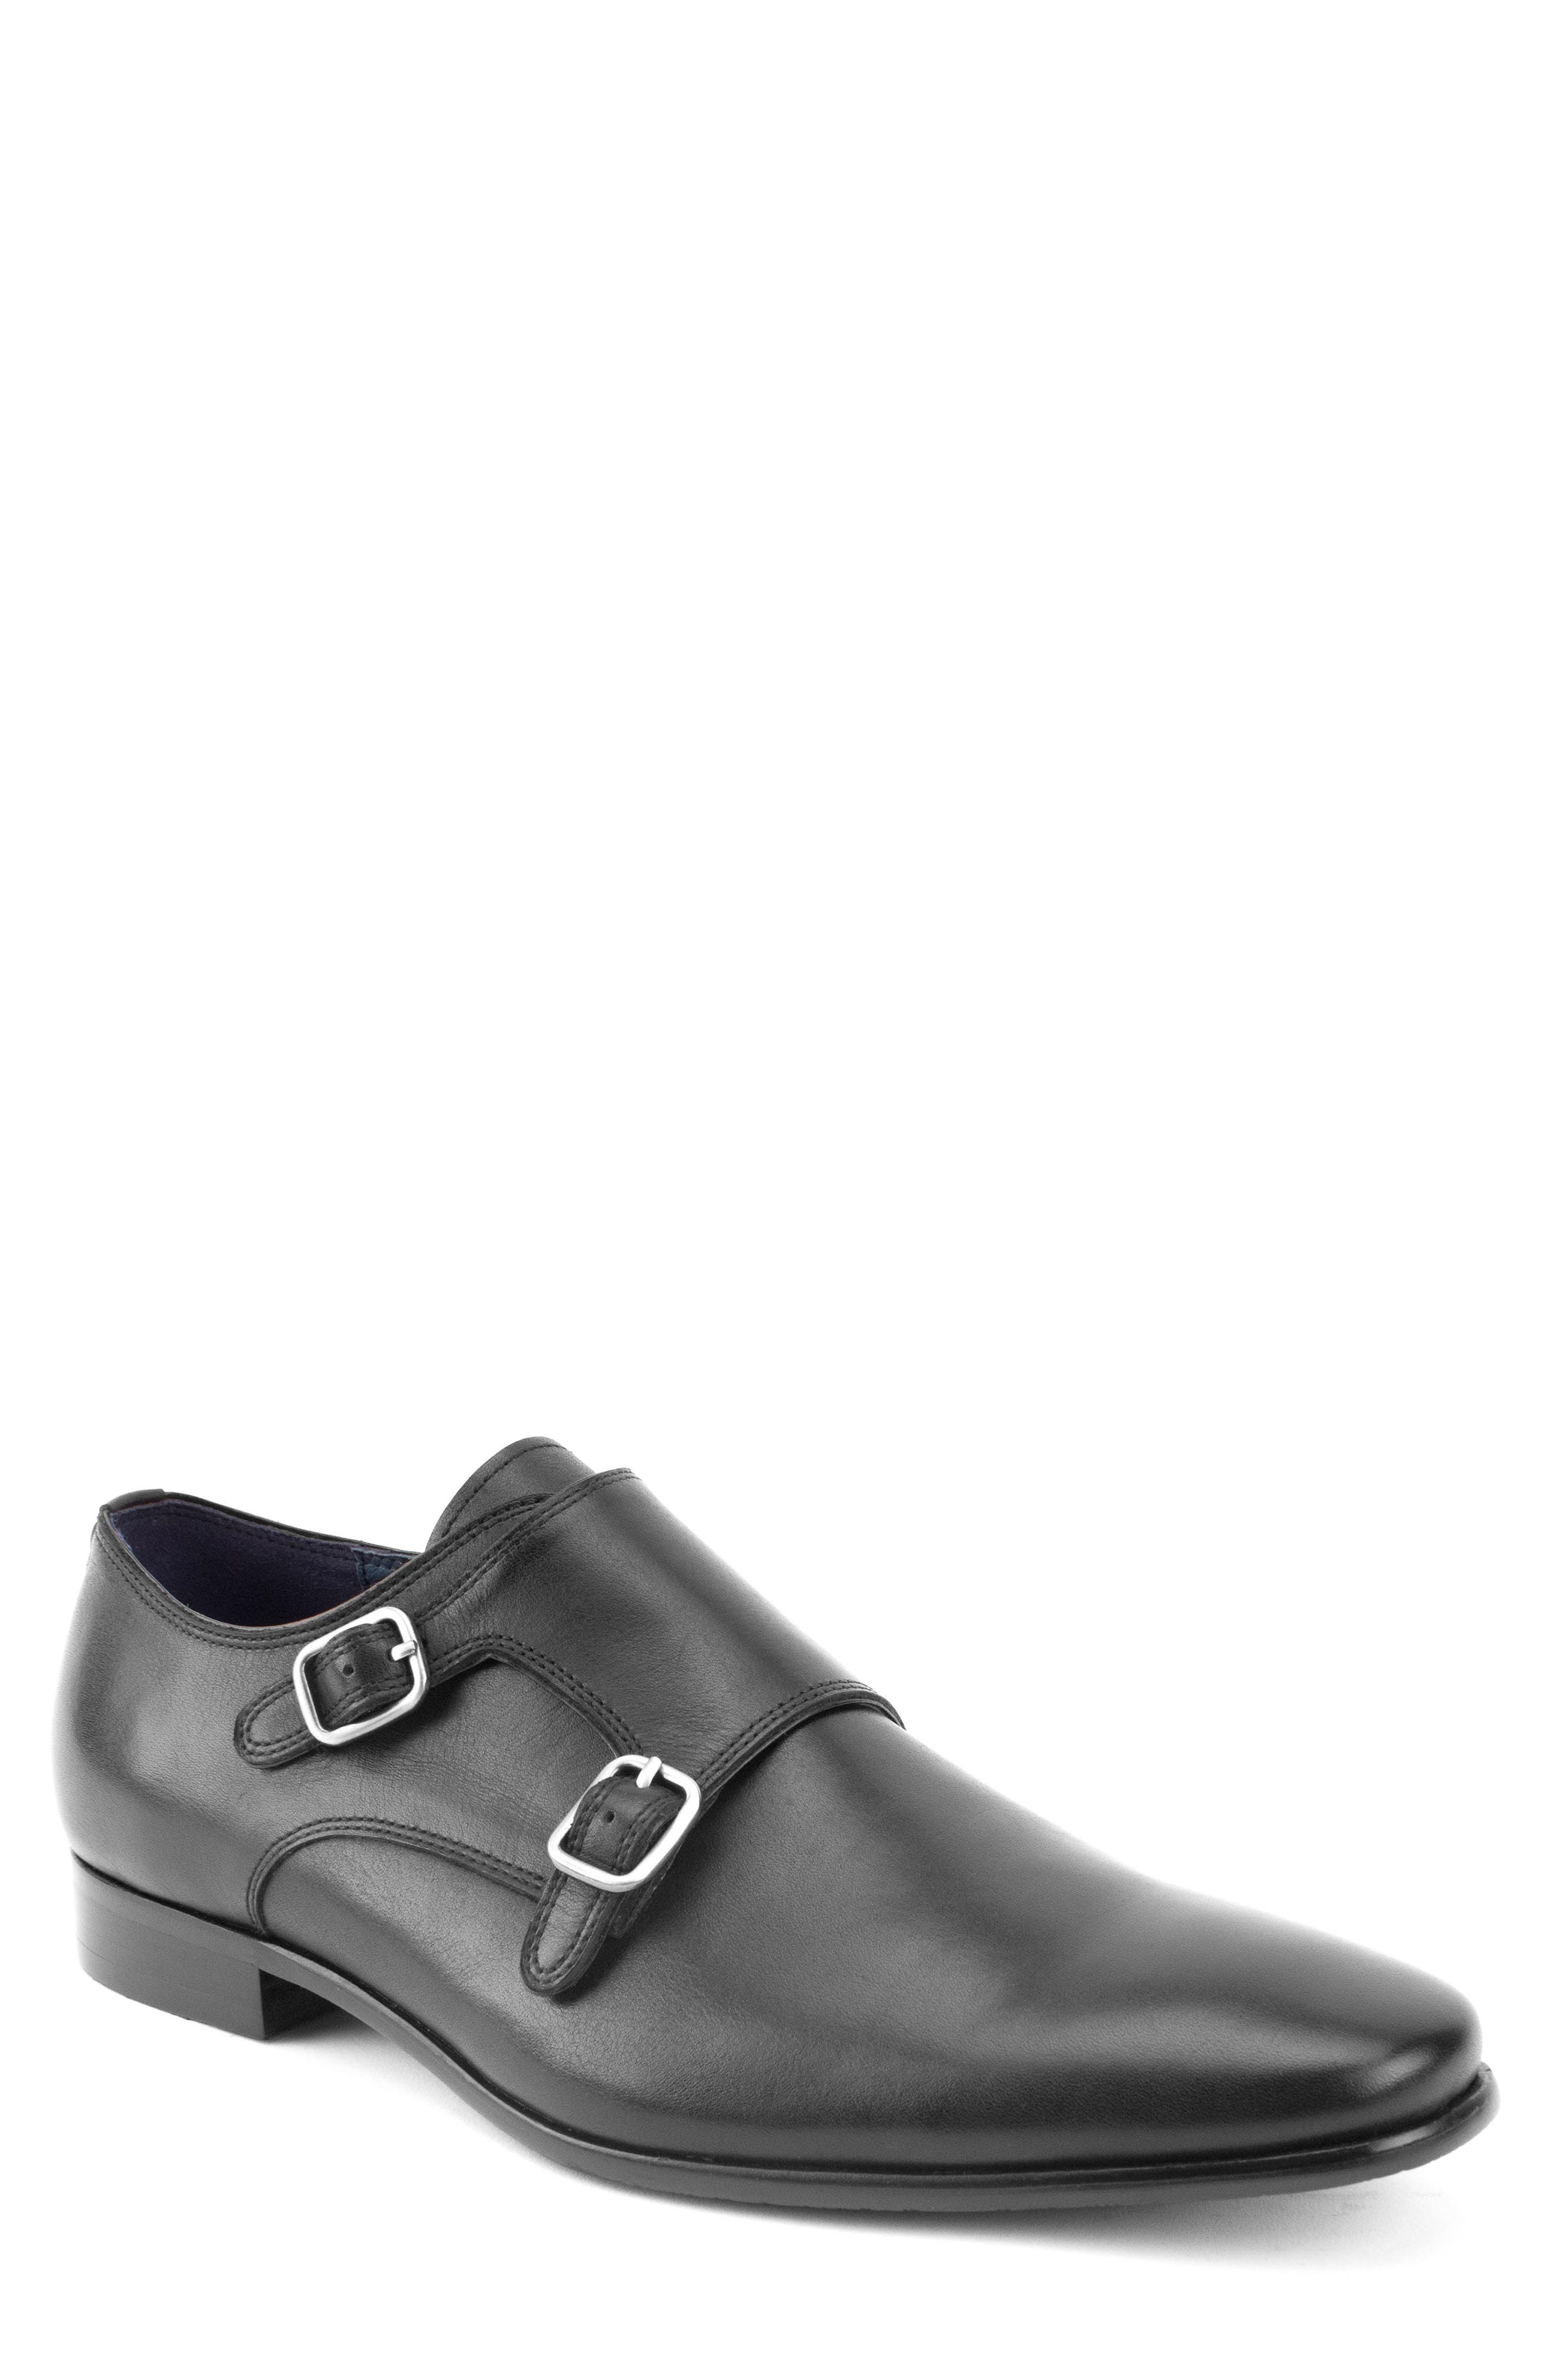 Luke Double Buckle Monk Shoe,                             Main thumbnail 1, color,                             BLACK LEATHER